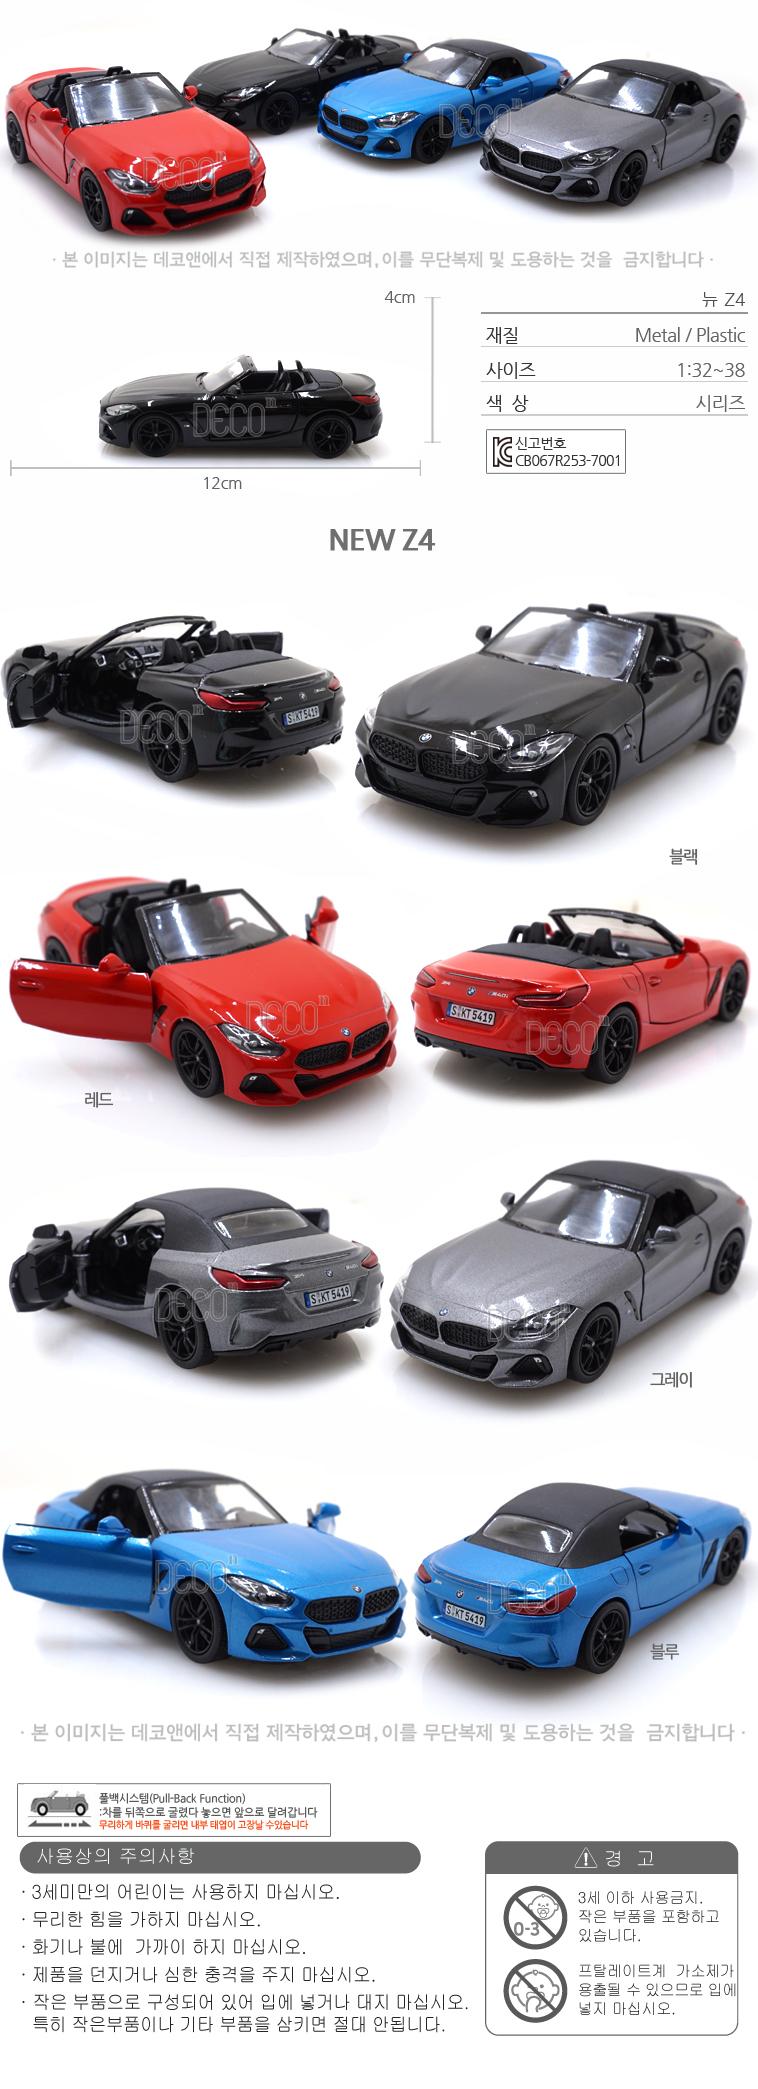 NEW BMW Z4 다이캐스트 미니카 13,000원-킨스마트키덜트/취미, 모형장난감, 자동차 모형, 스포츠카바보사랑NEW BMW Z4 다이캐스트 미니카 13,000원-킨스마트키덜트/취미, 모형장난감, 자동차 모형, 스포츠카바보사랑